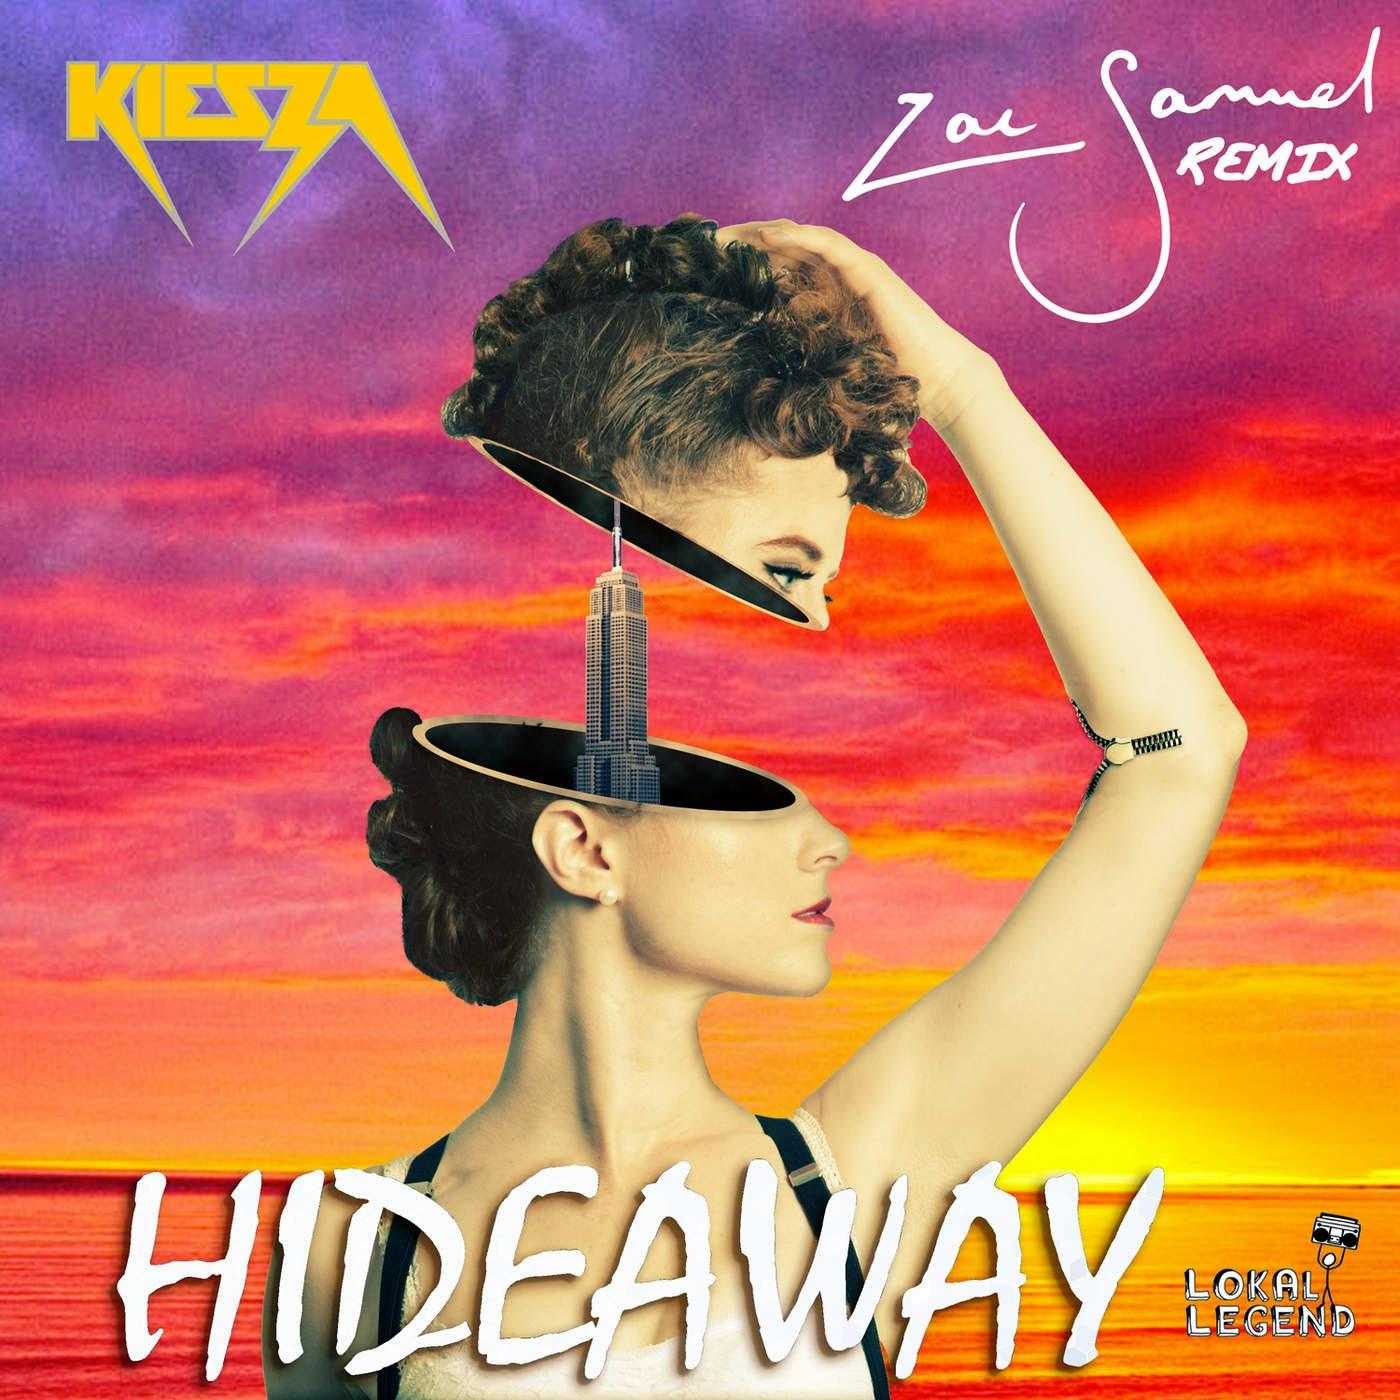 Kiesza - Hideaway (Zac Samuel Remix) - Single Cover